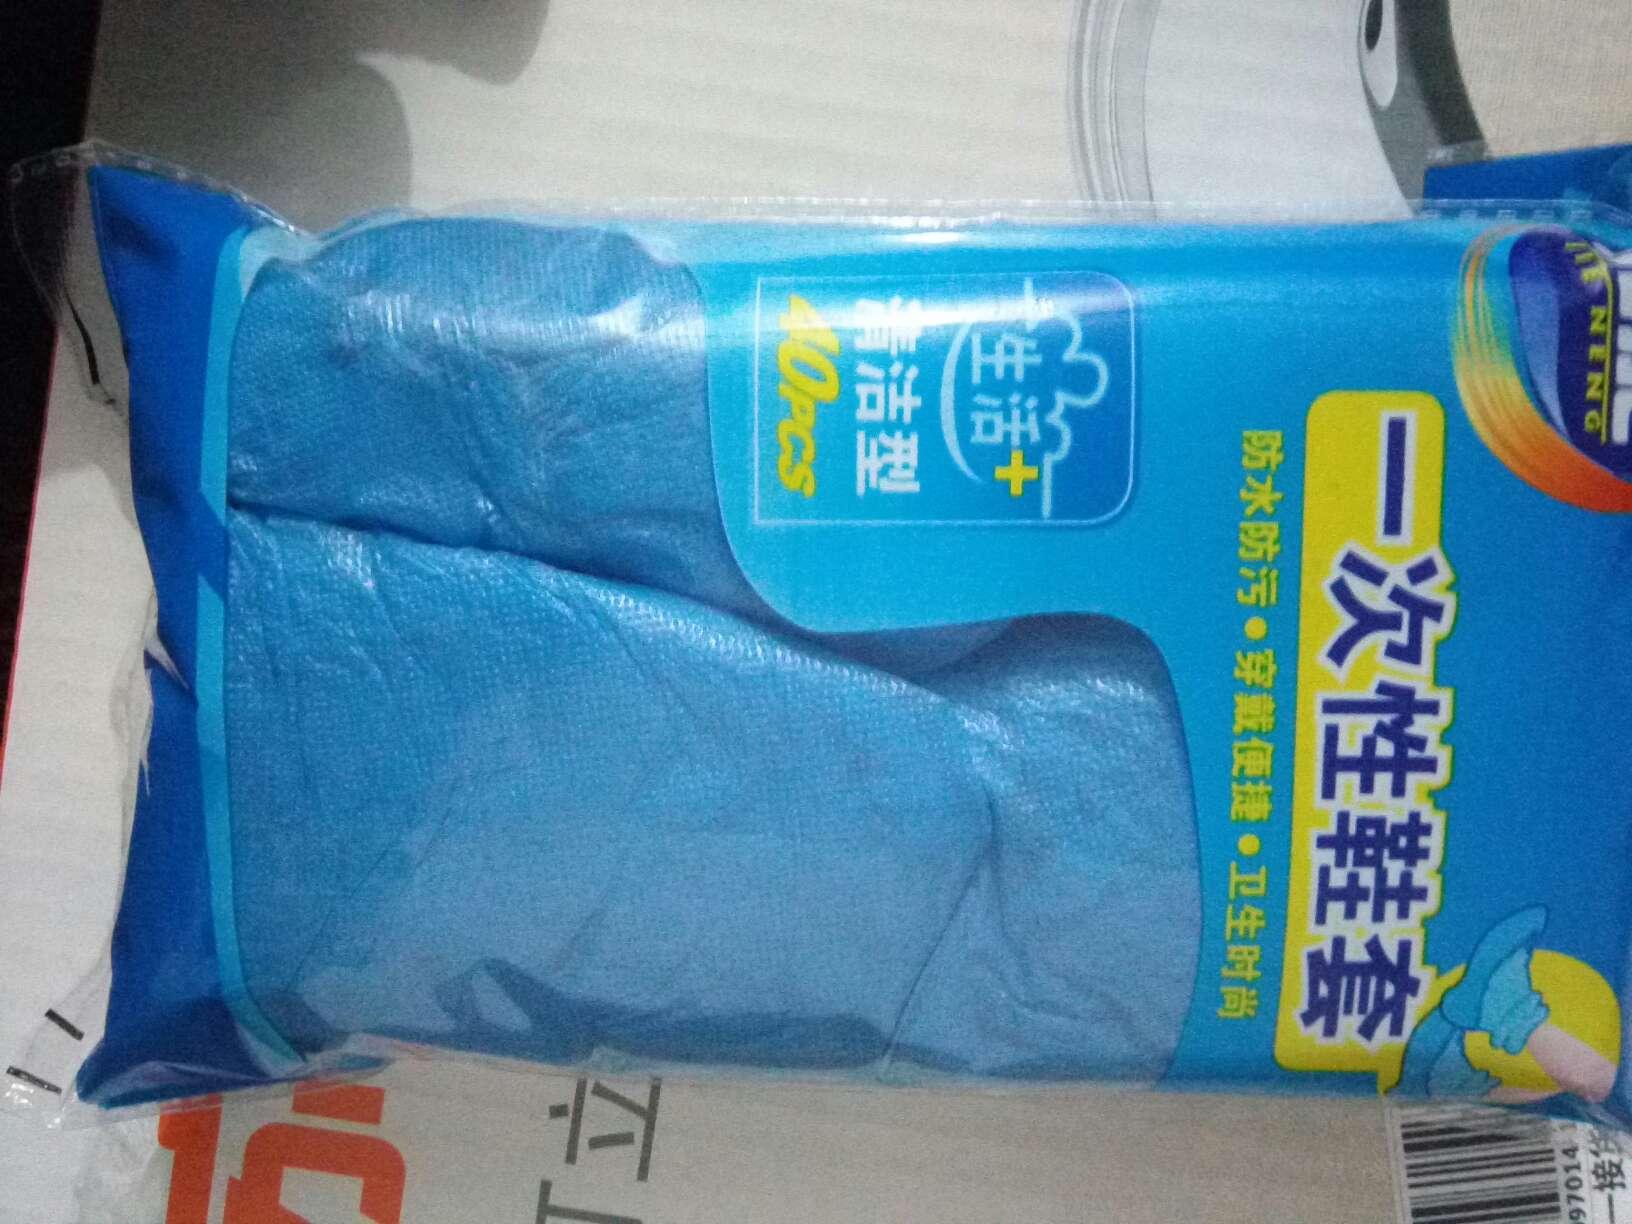 all jordan retro 10 colorways 00987660 forsale